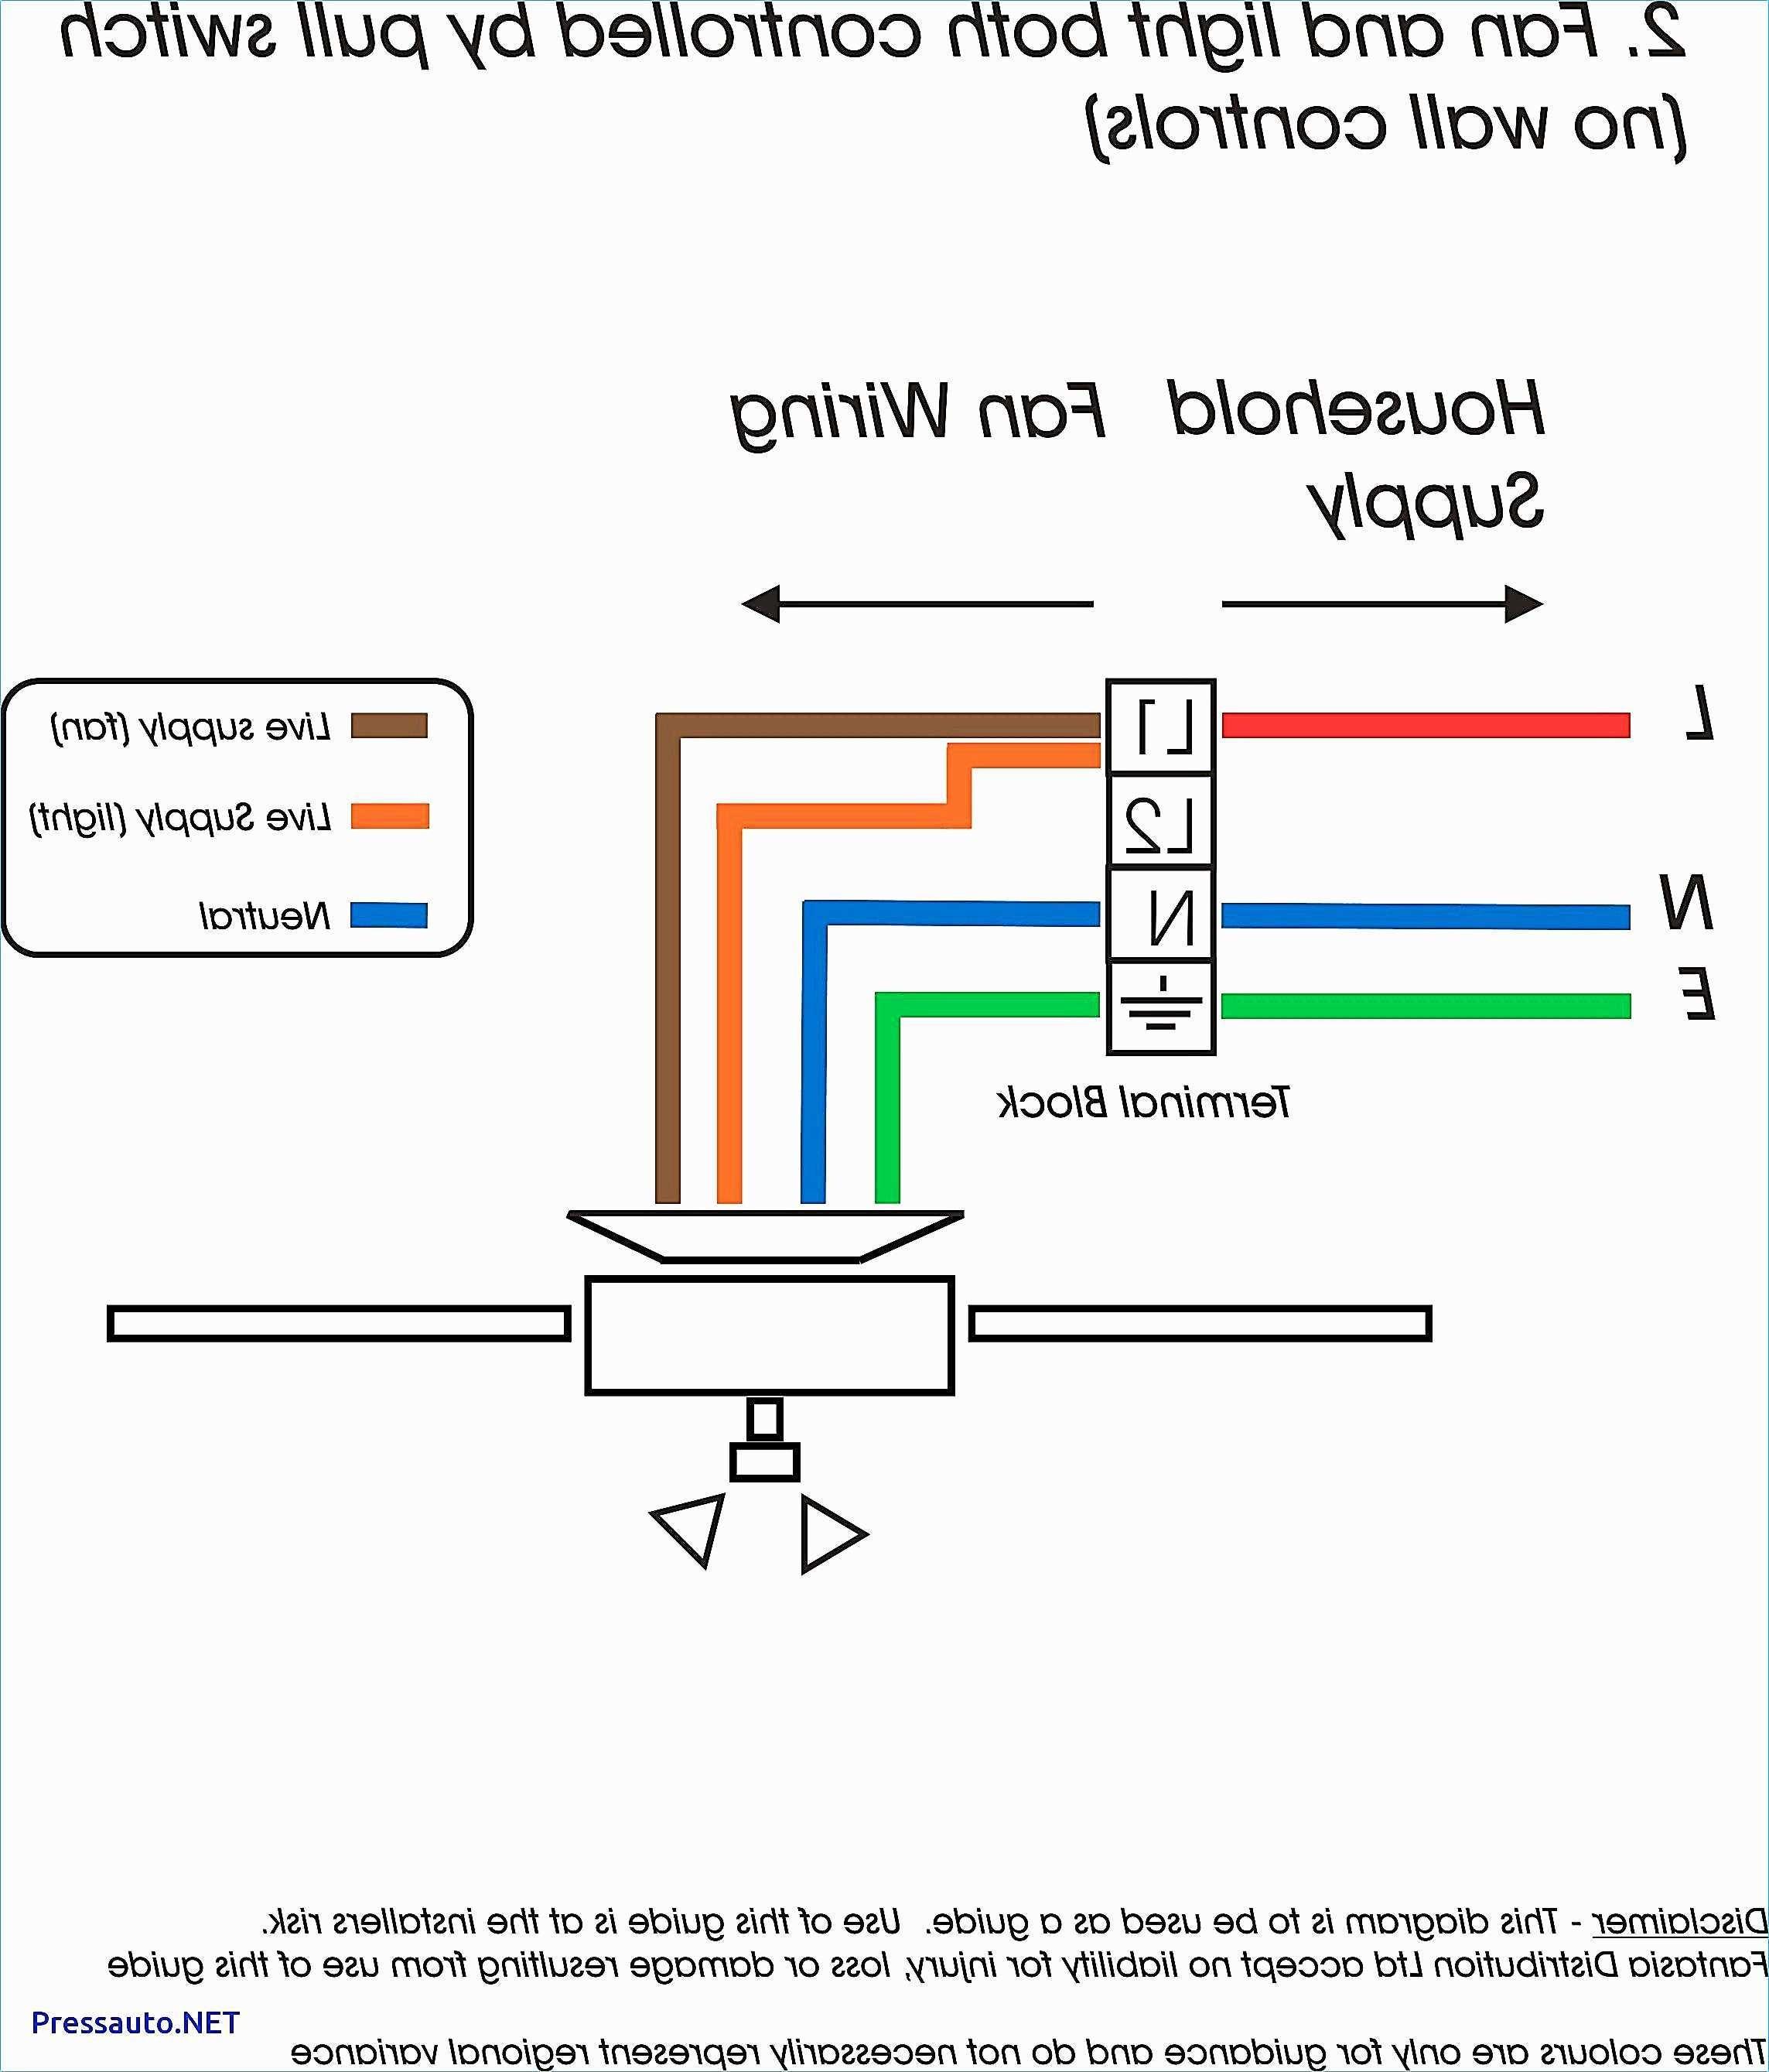 Traxxas Tqi Receiver Wiring Diagram | Electrick Wiring Diagram @co - Traxxas Tqi Receiver Wiring Diagram